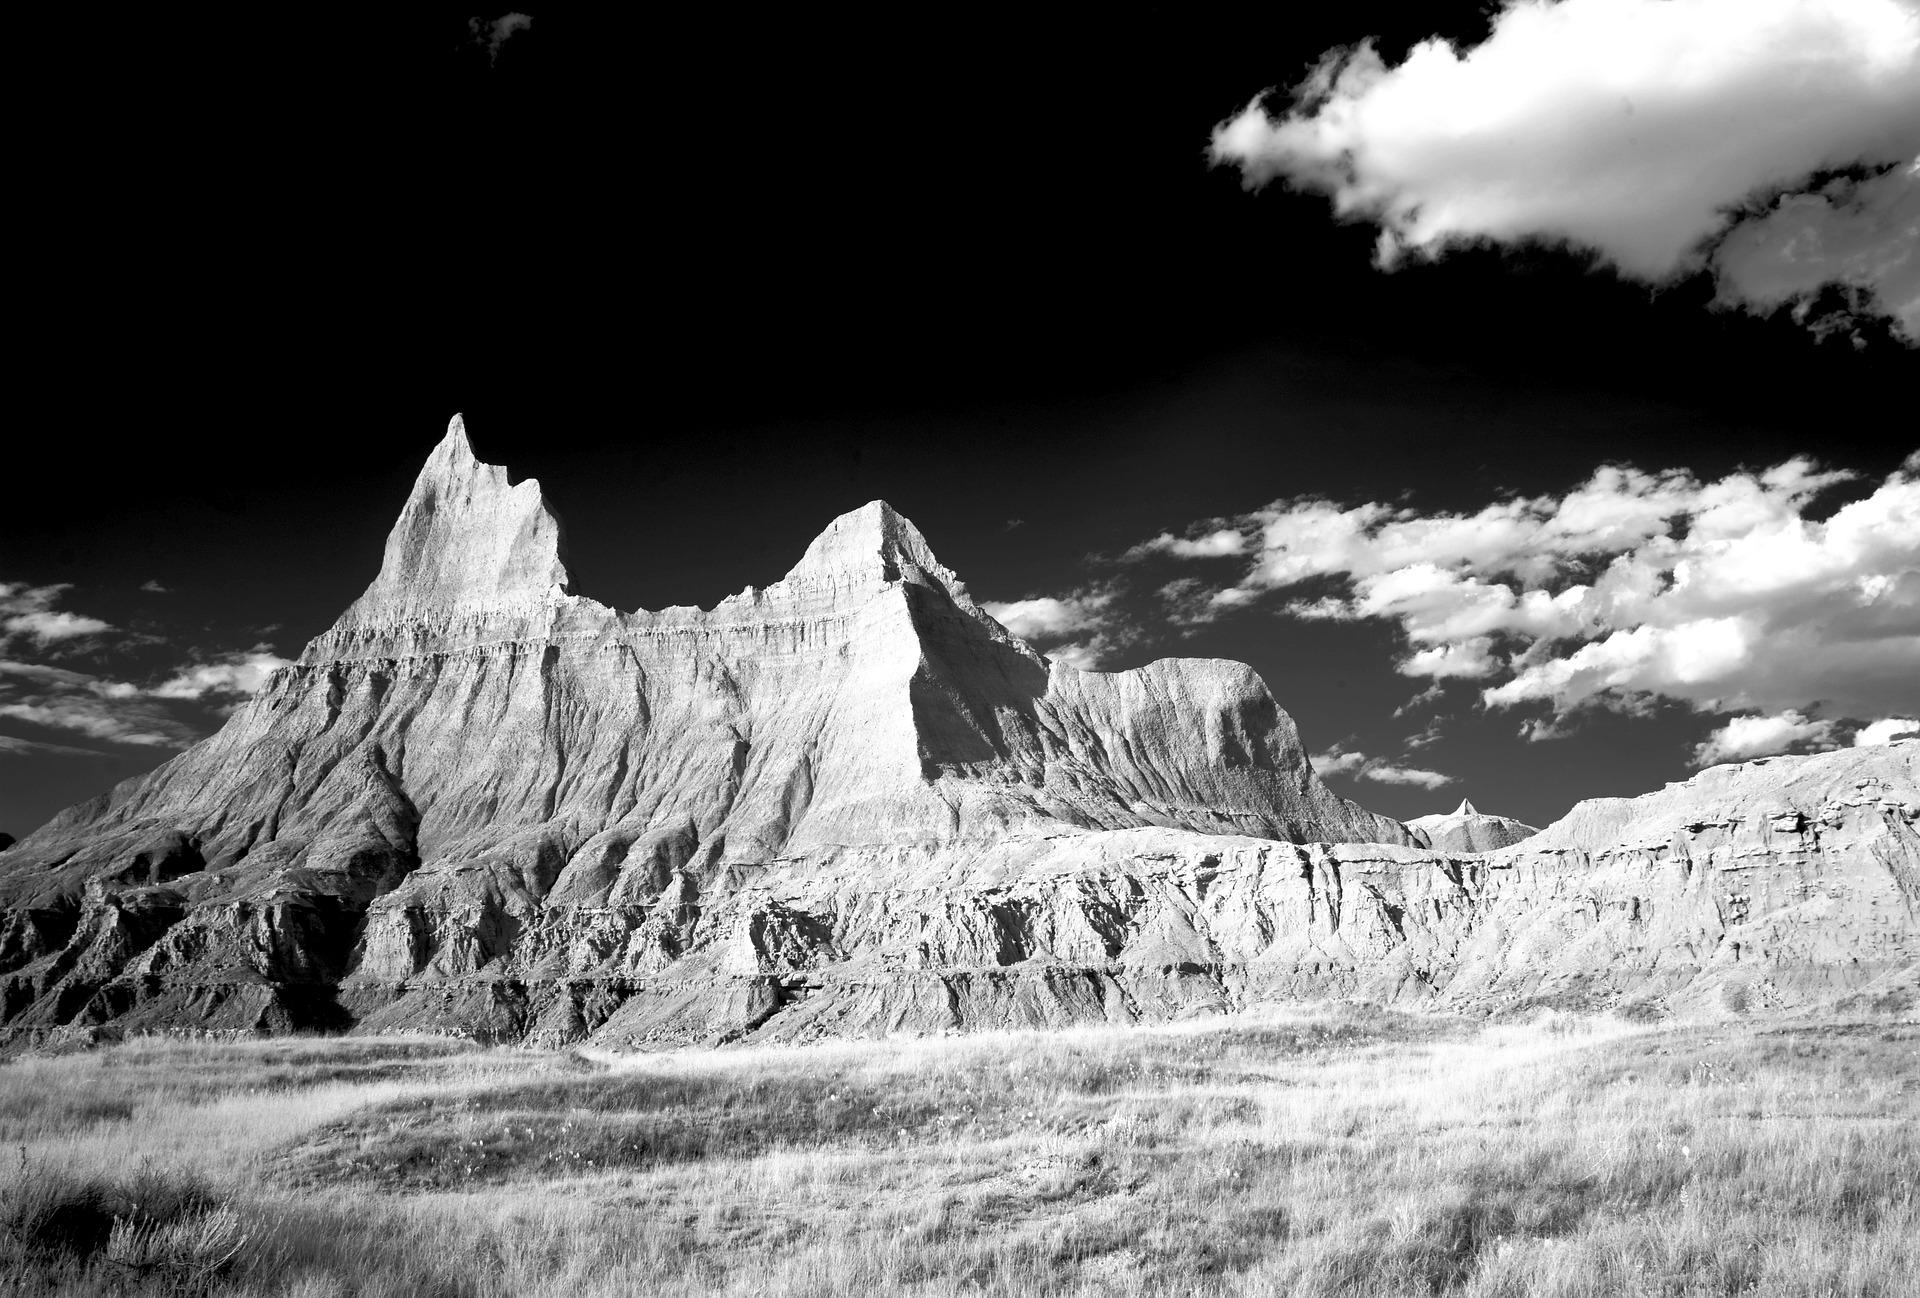 Bad lands photo